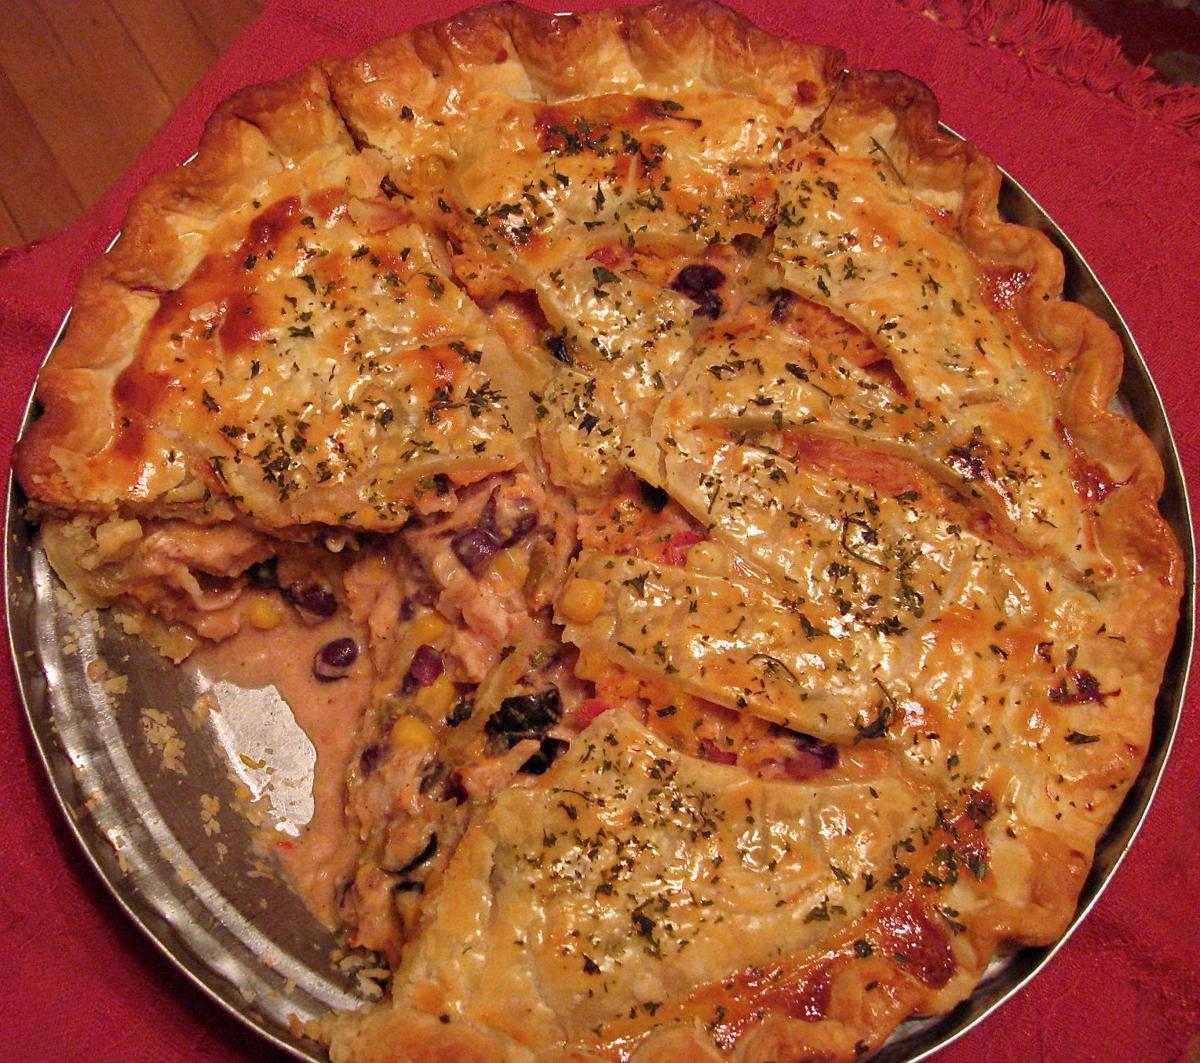 Southwestern Turkey Pie